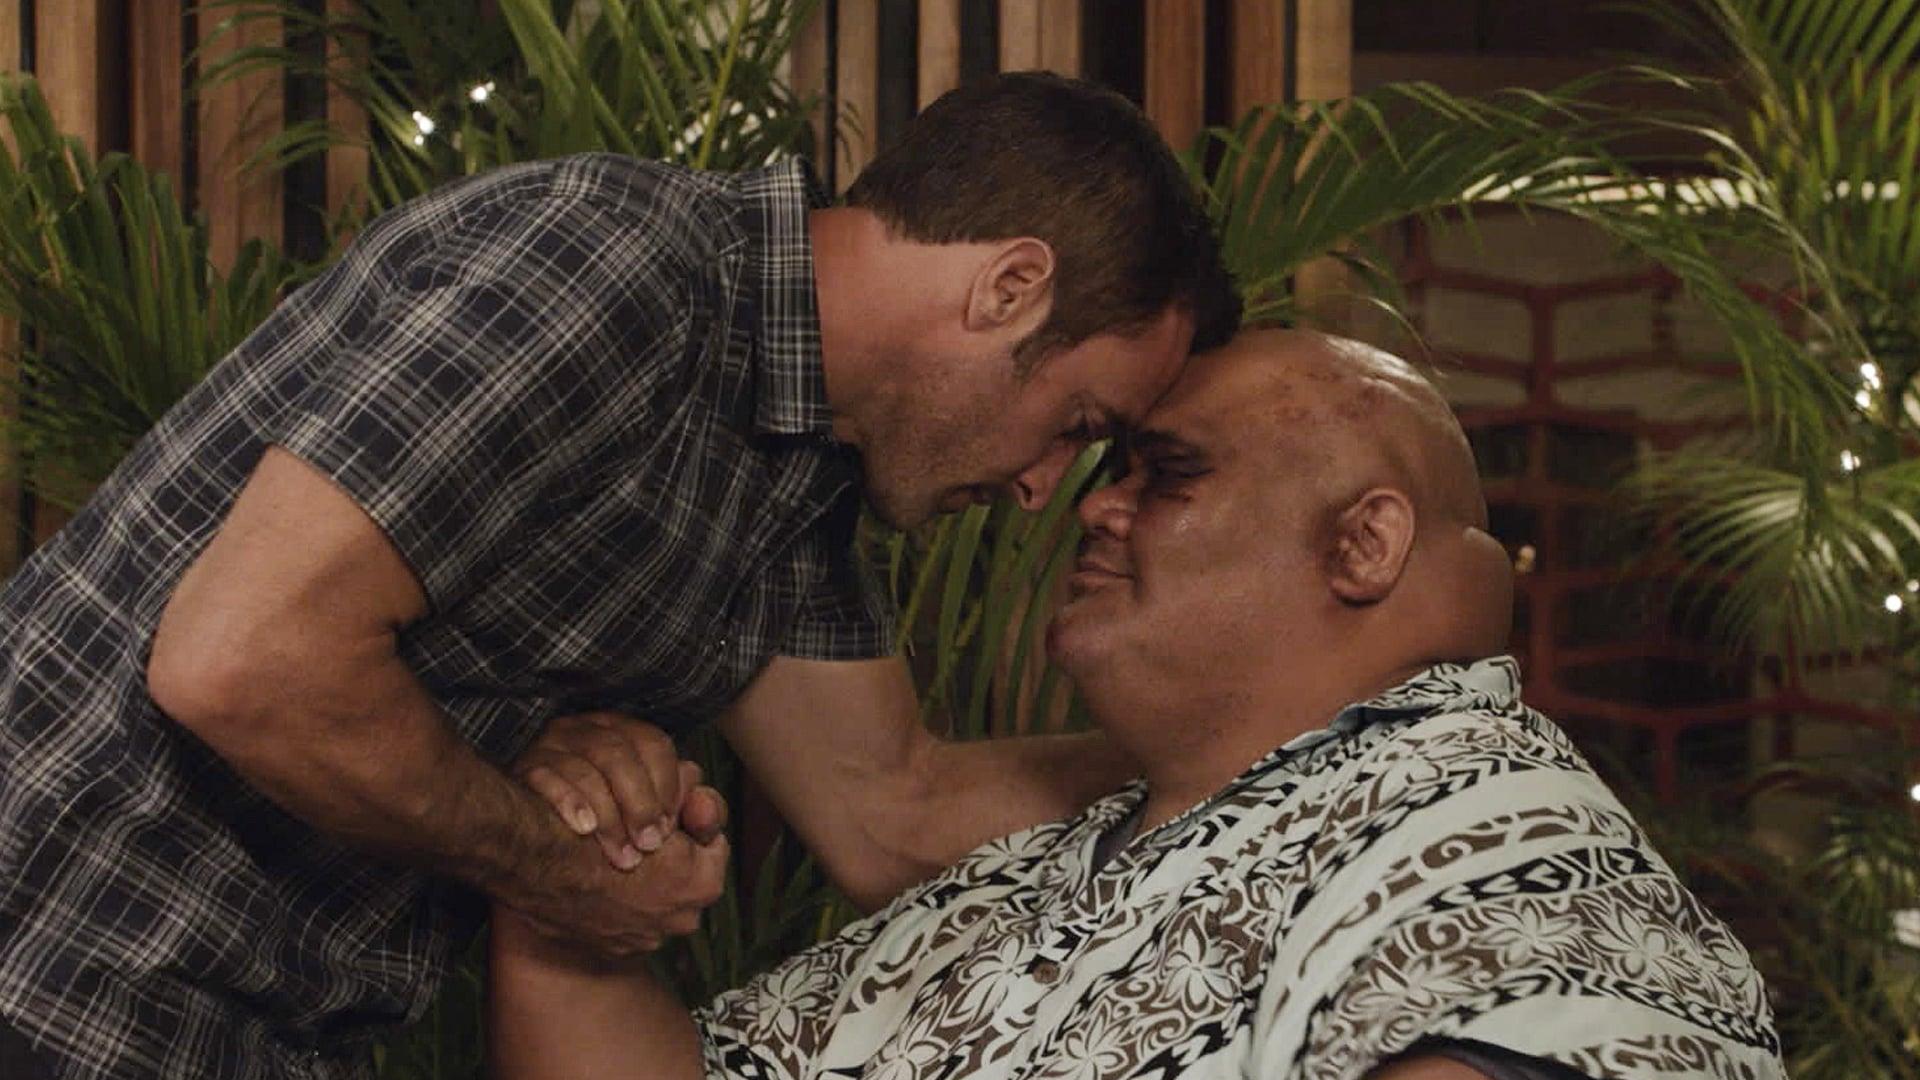 Hawaii Five-0 - Season 8 Episode 4 : E uhi wale no 'a'ole e nalo, he imu puhi (No Matter How Much One Covers a Steaming Imu, The Smoke Will Rise)